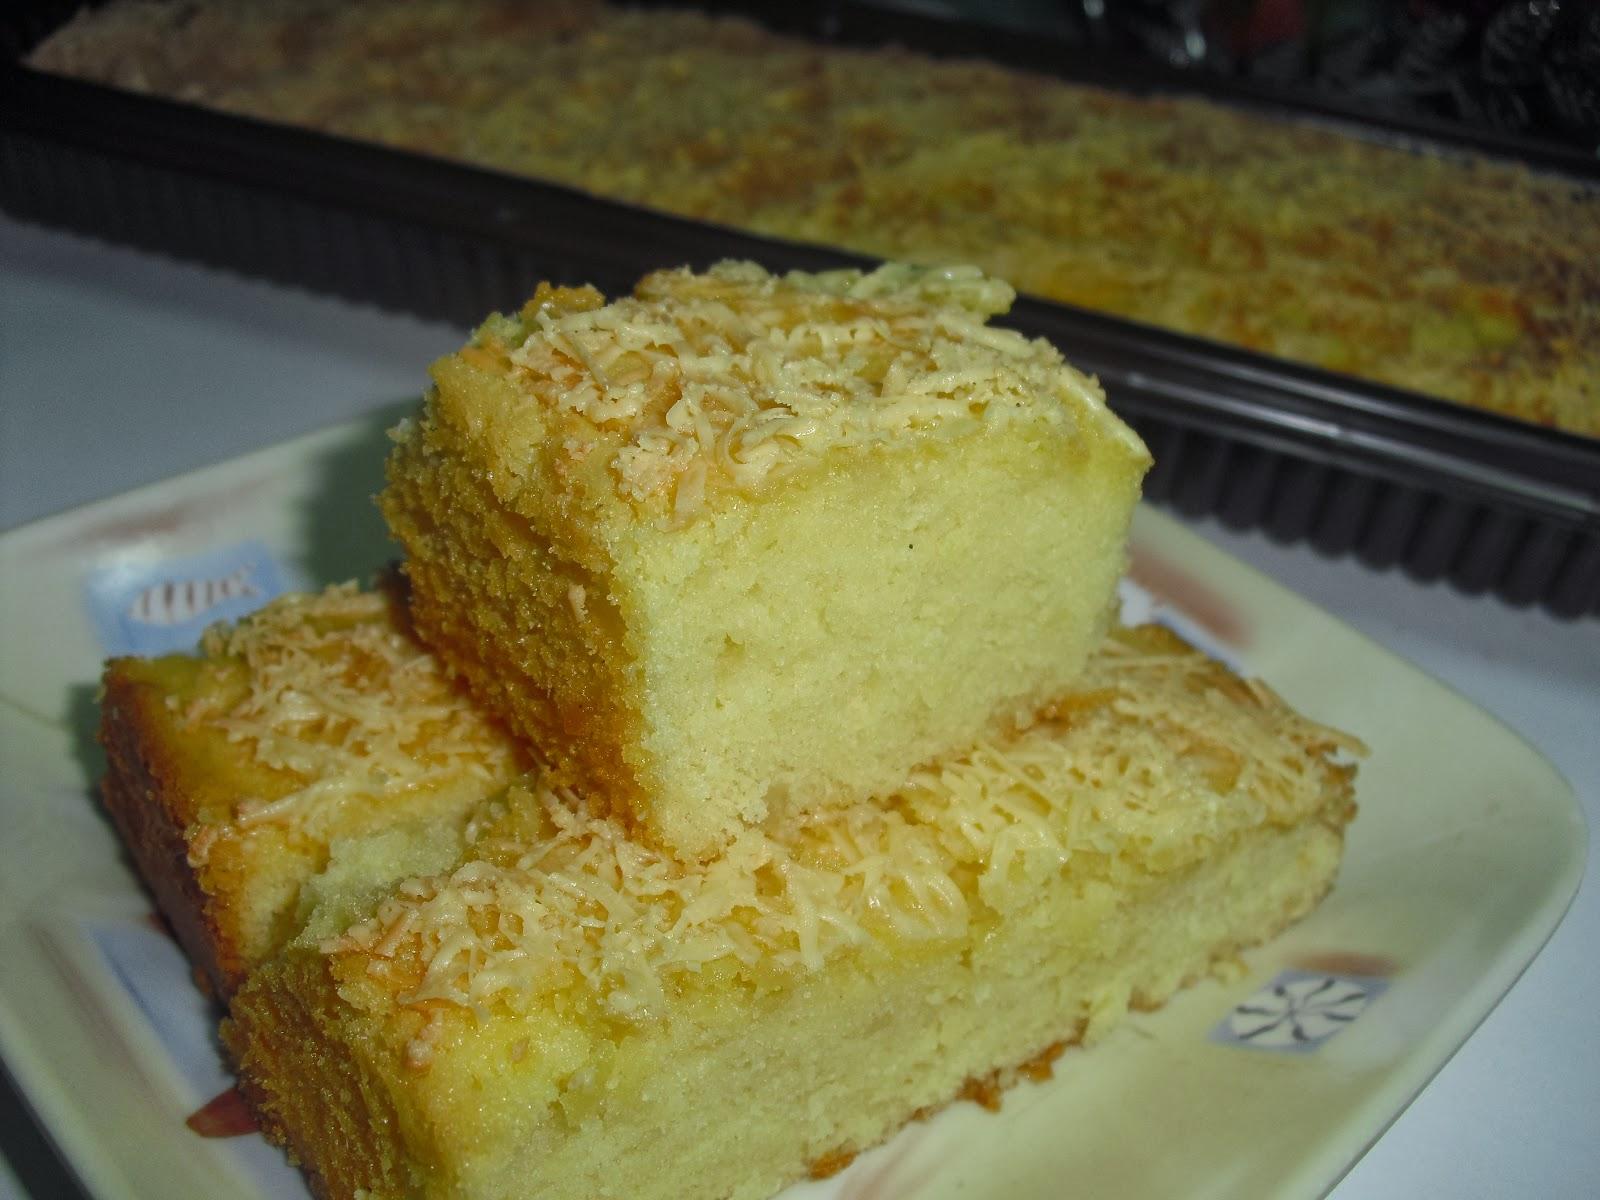 Resep Cake Singkong Jtt: Linggar CAKE: RESEP * SPONGE CAKE TAPE SINGKONG